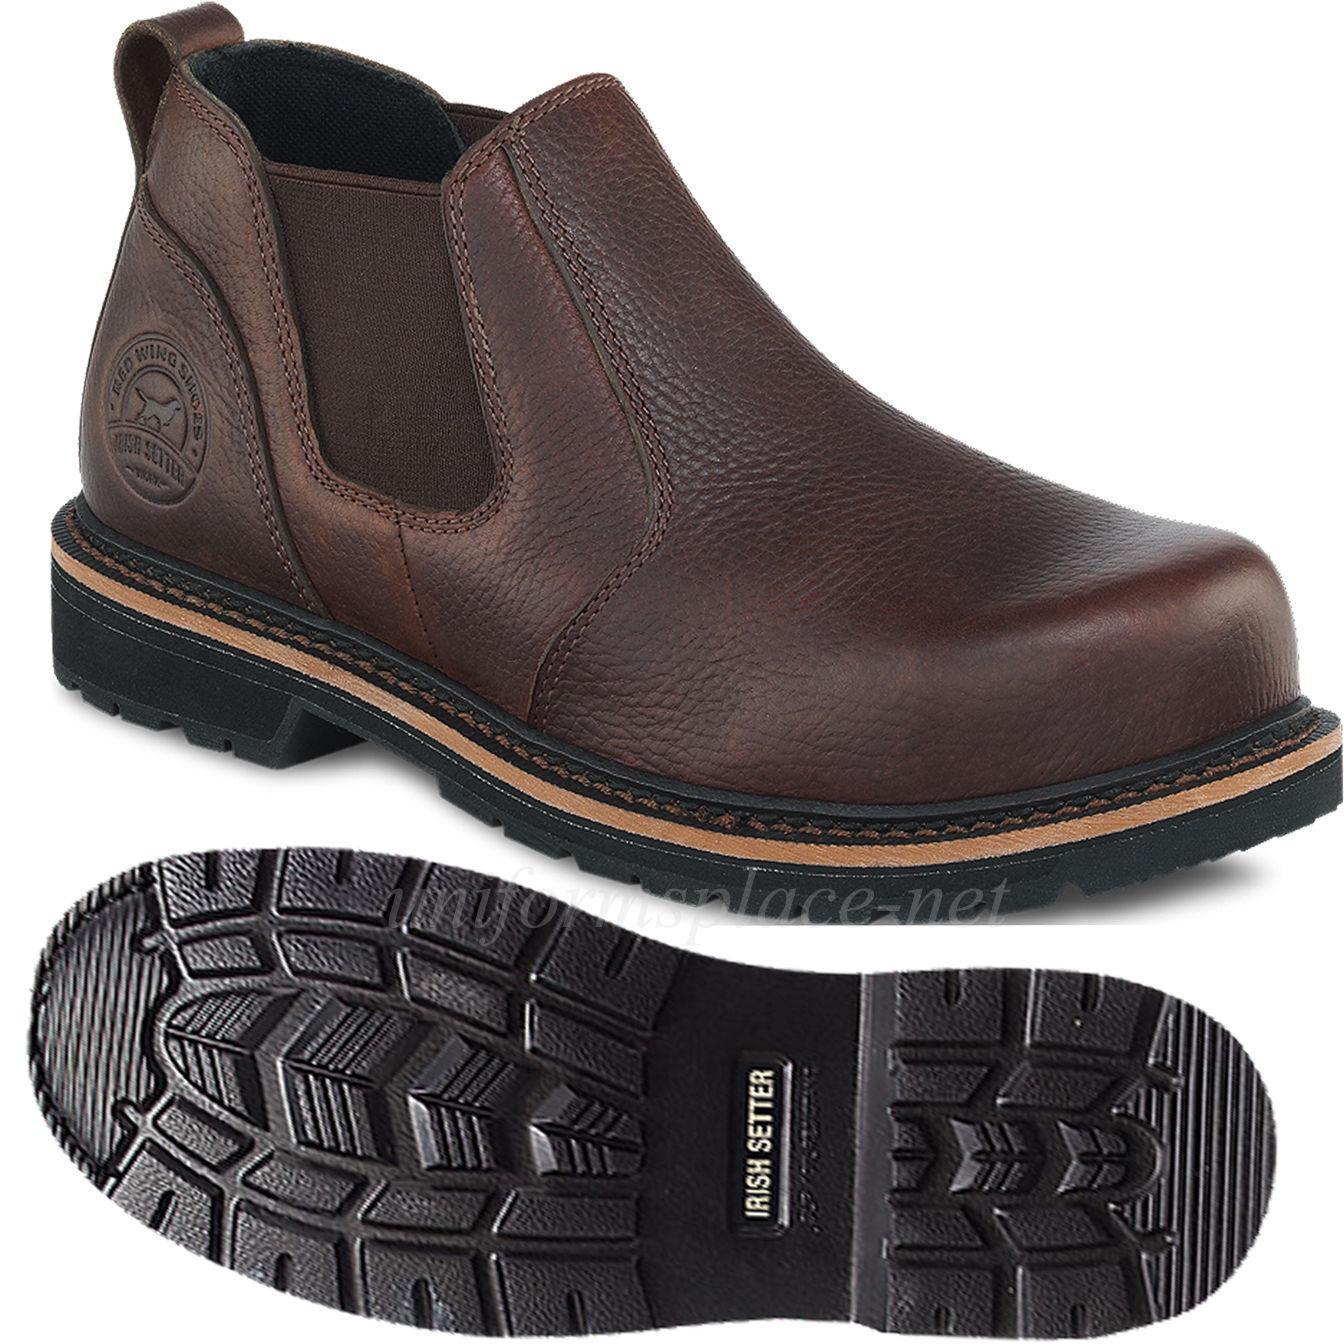 Uomo Stivali Red Wing Irish Setter Cass Steel Toe Romeo Slip-On Pelle Shoes